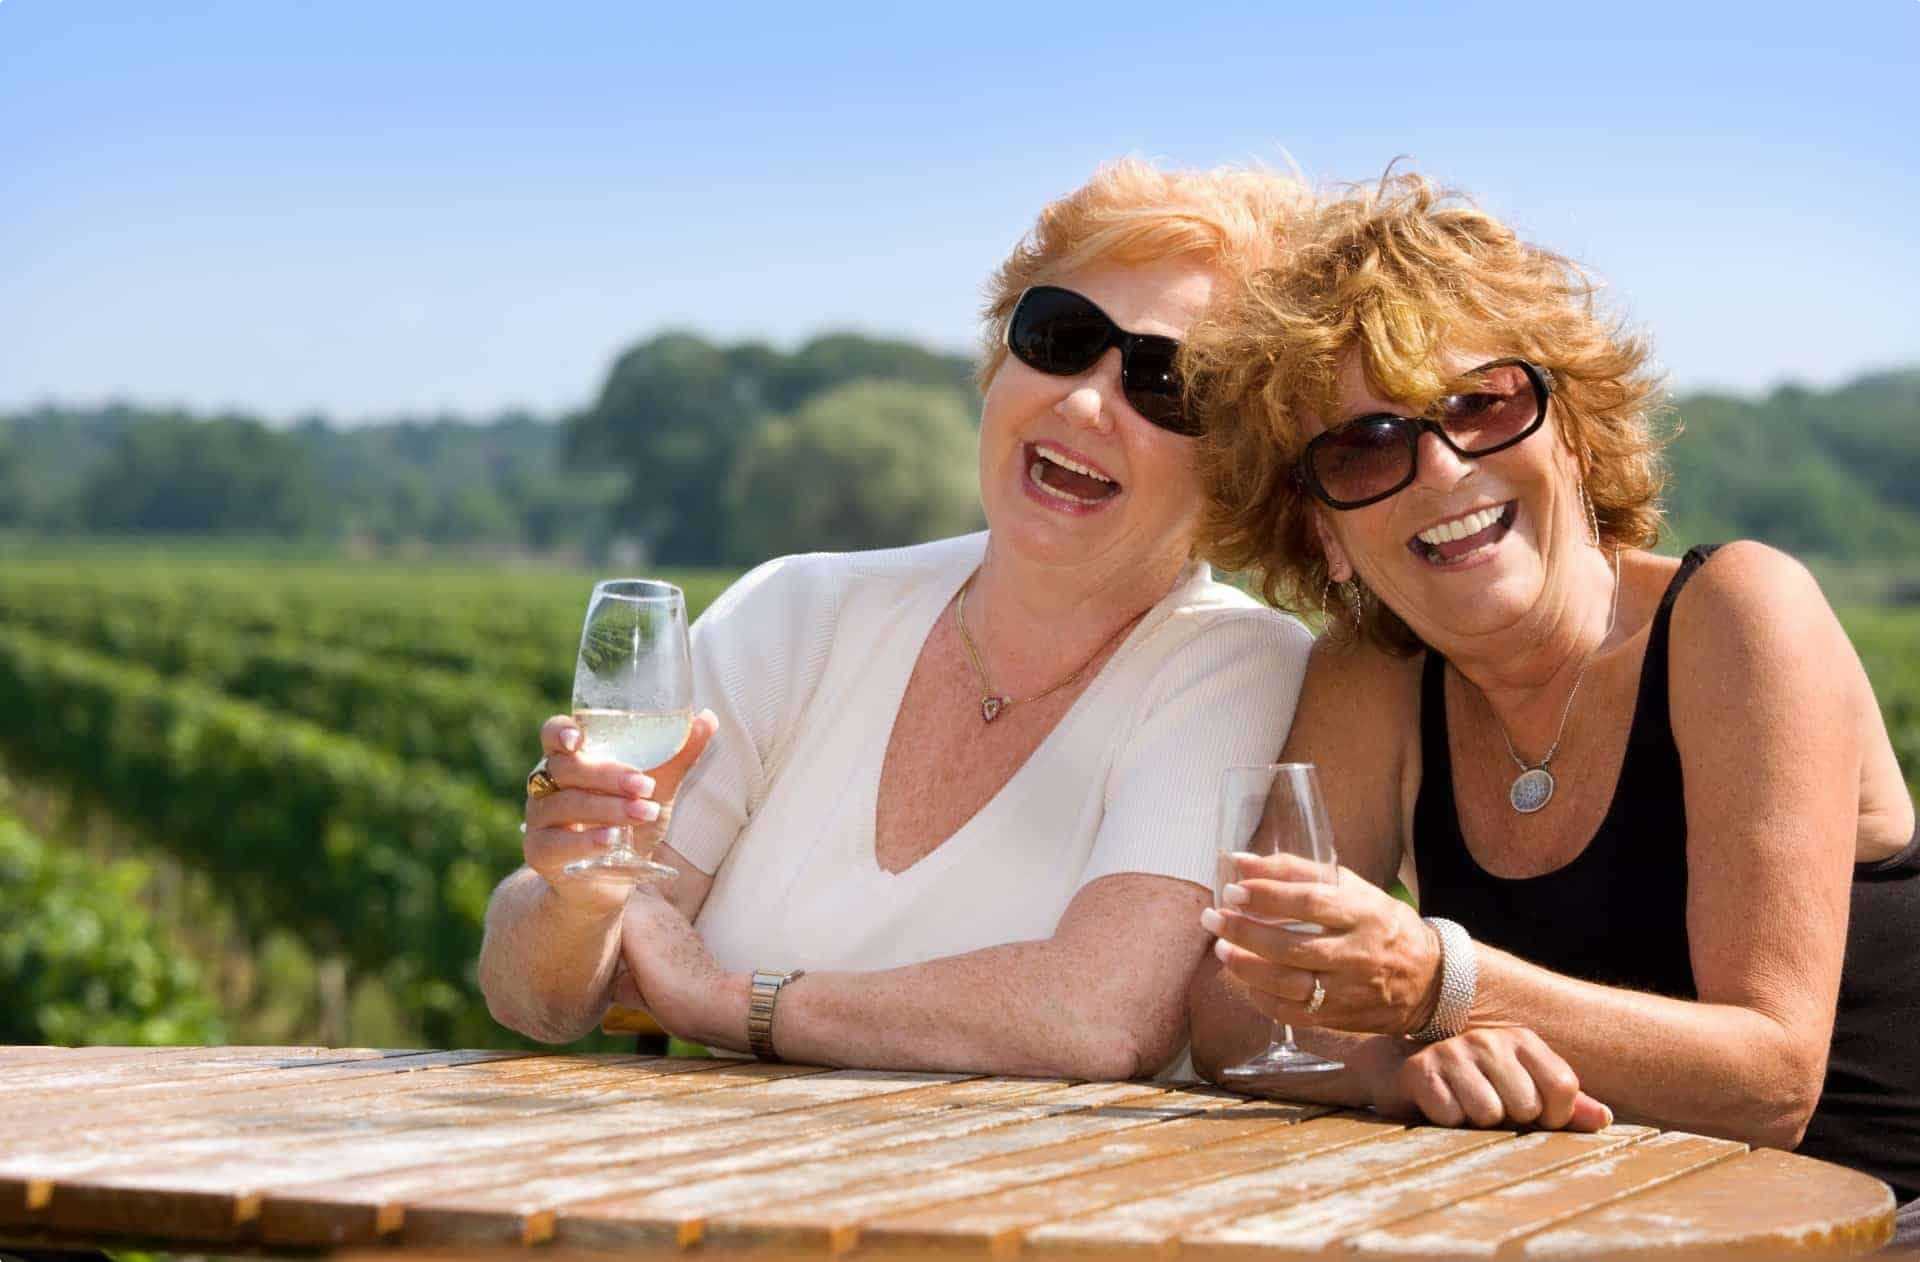 Friends celebrating with wine